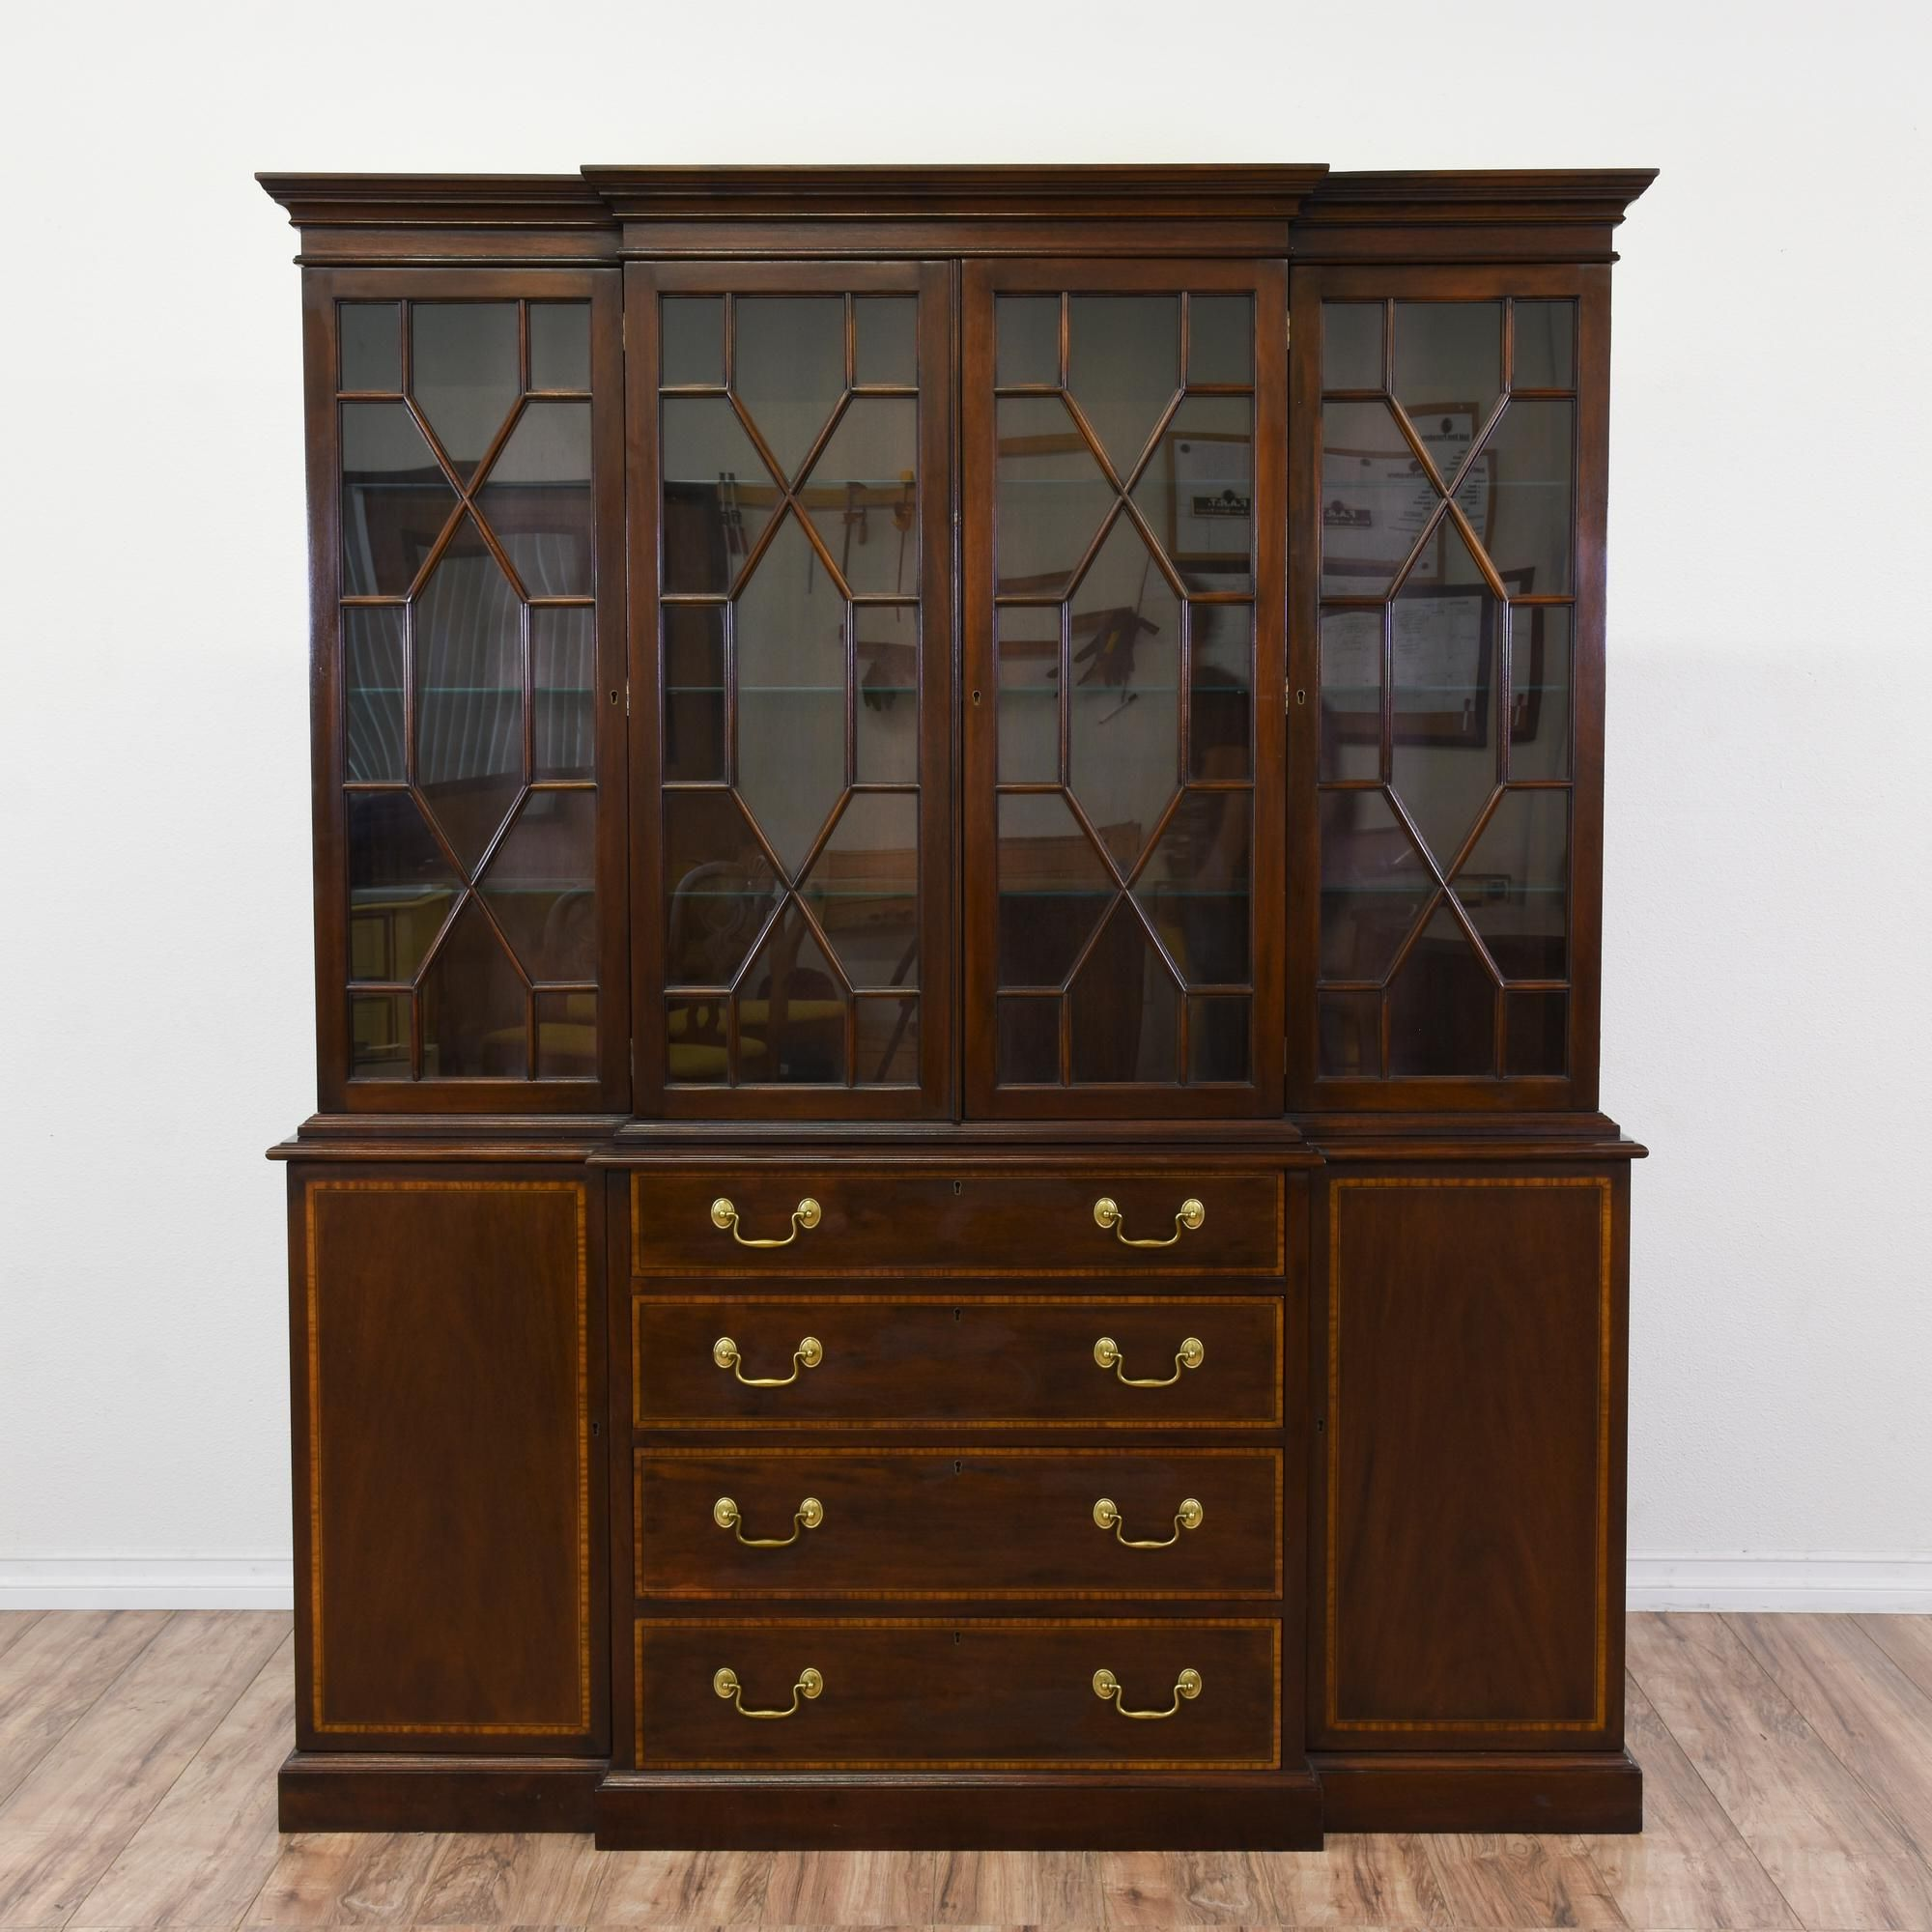 Gorgeous large mahogany china cabinet. At 6.5 feet tall, this ...